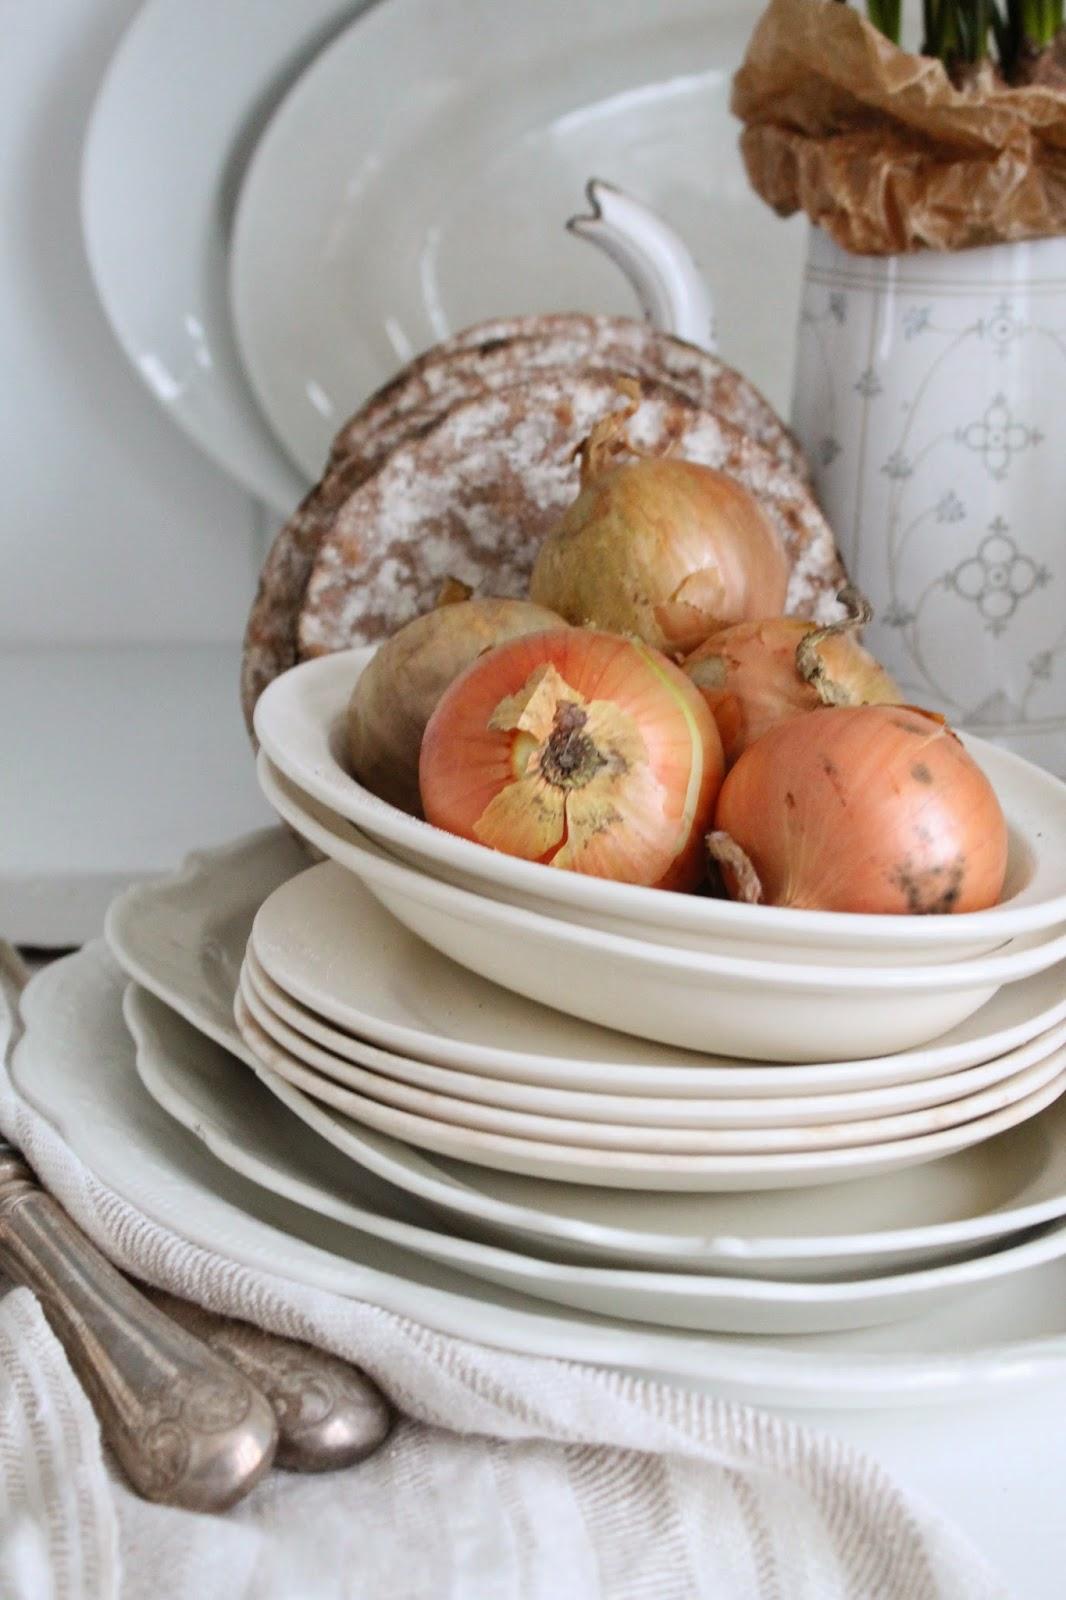 dekor/vesennii-dekor-svoimi-rukami-foto-5.jpg